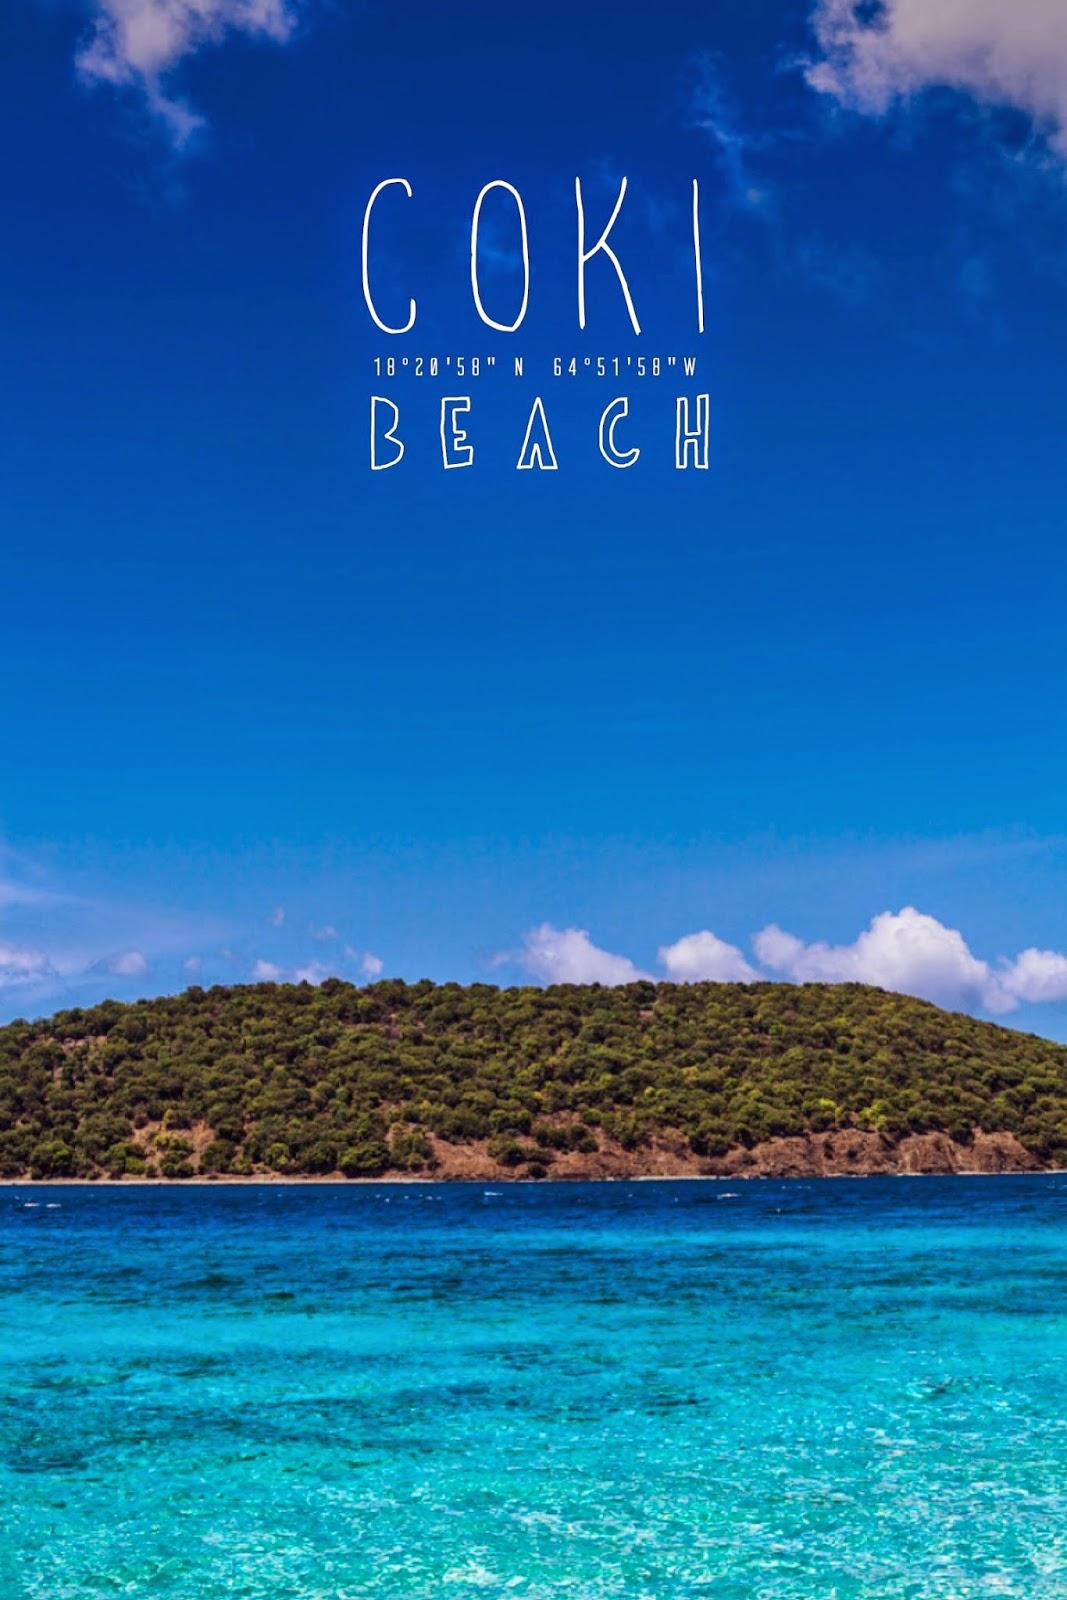 Coki Beach Day 171 Theislander